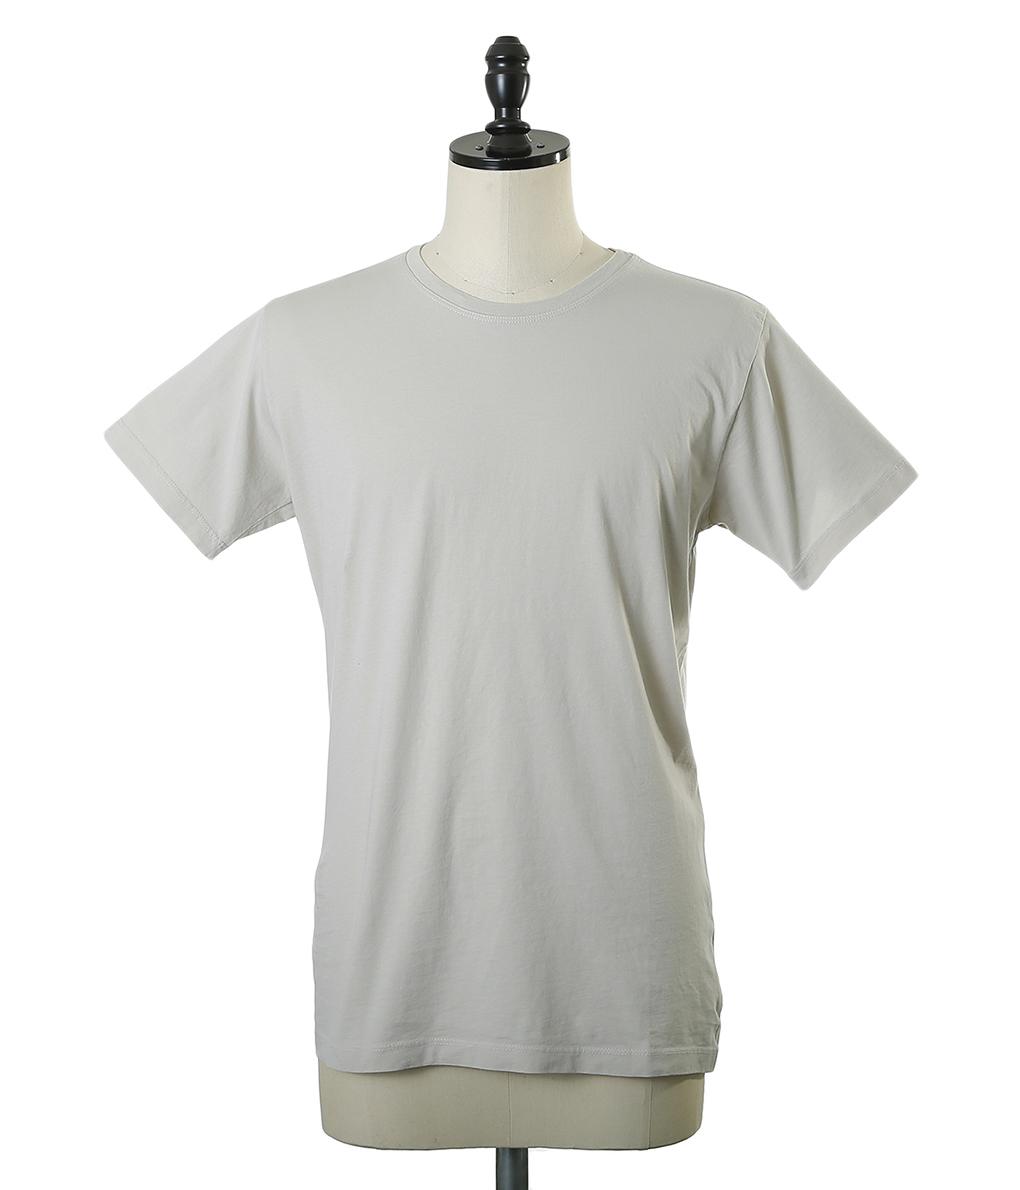 JOHN ELLIOTT / ジョン エリオット : CLASSIC CREW : クラシック クルー Tシャツ メンズ : 2920900073-bjb 【BJB】